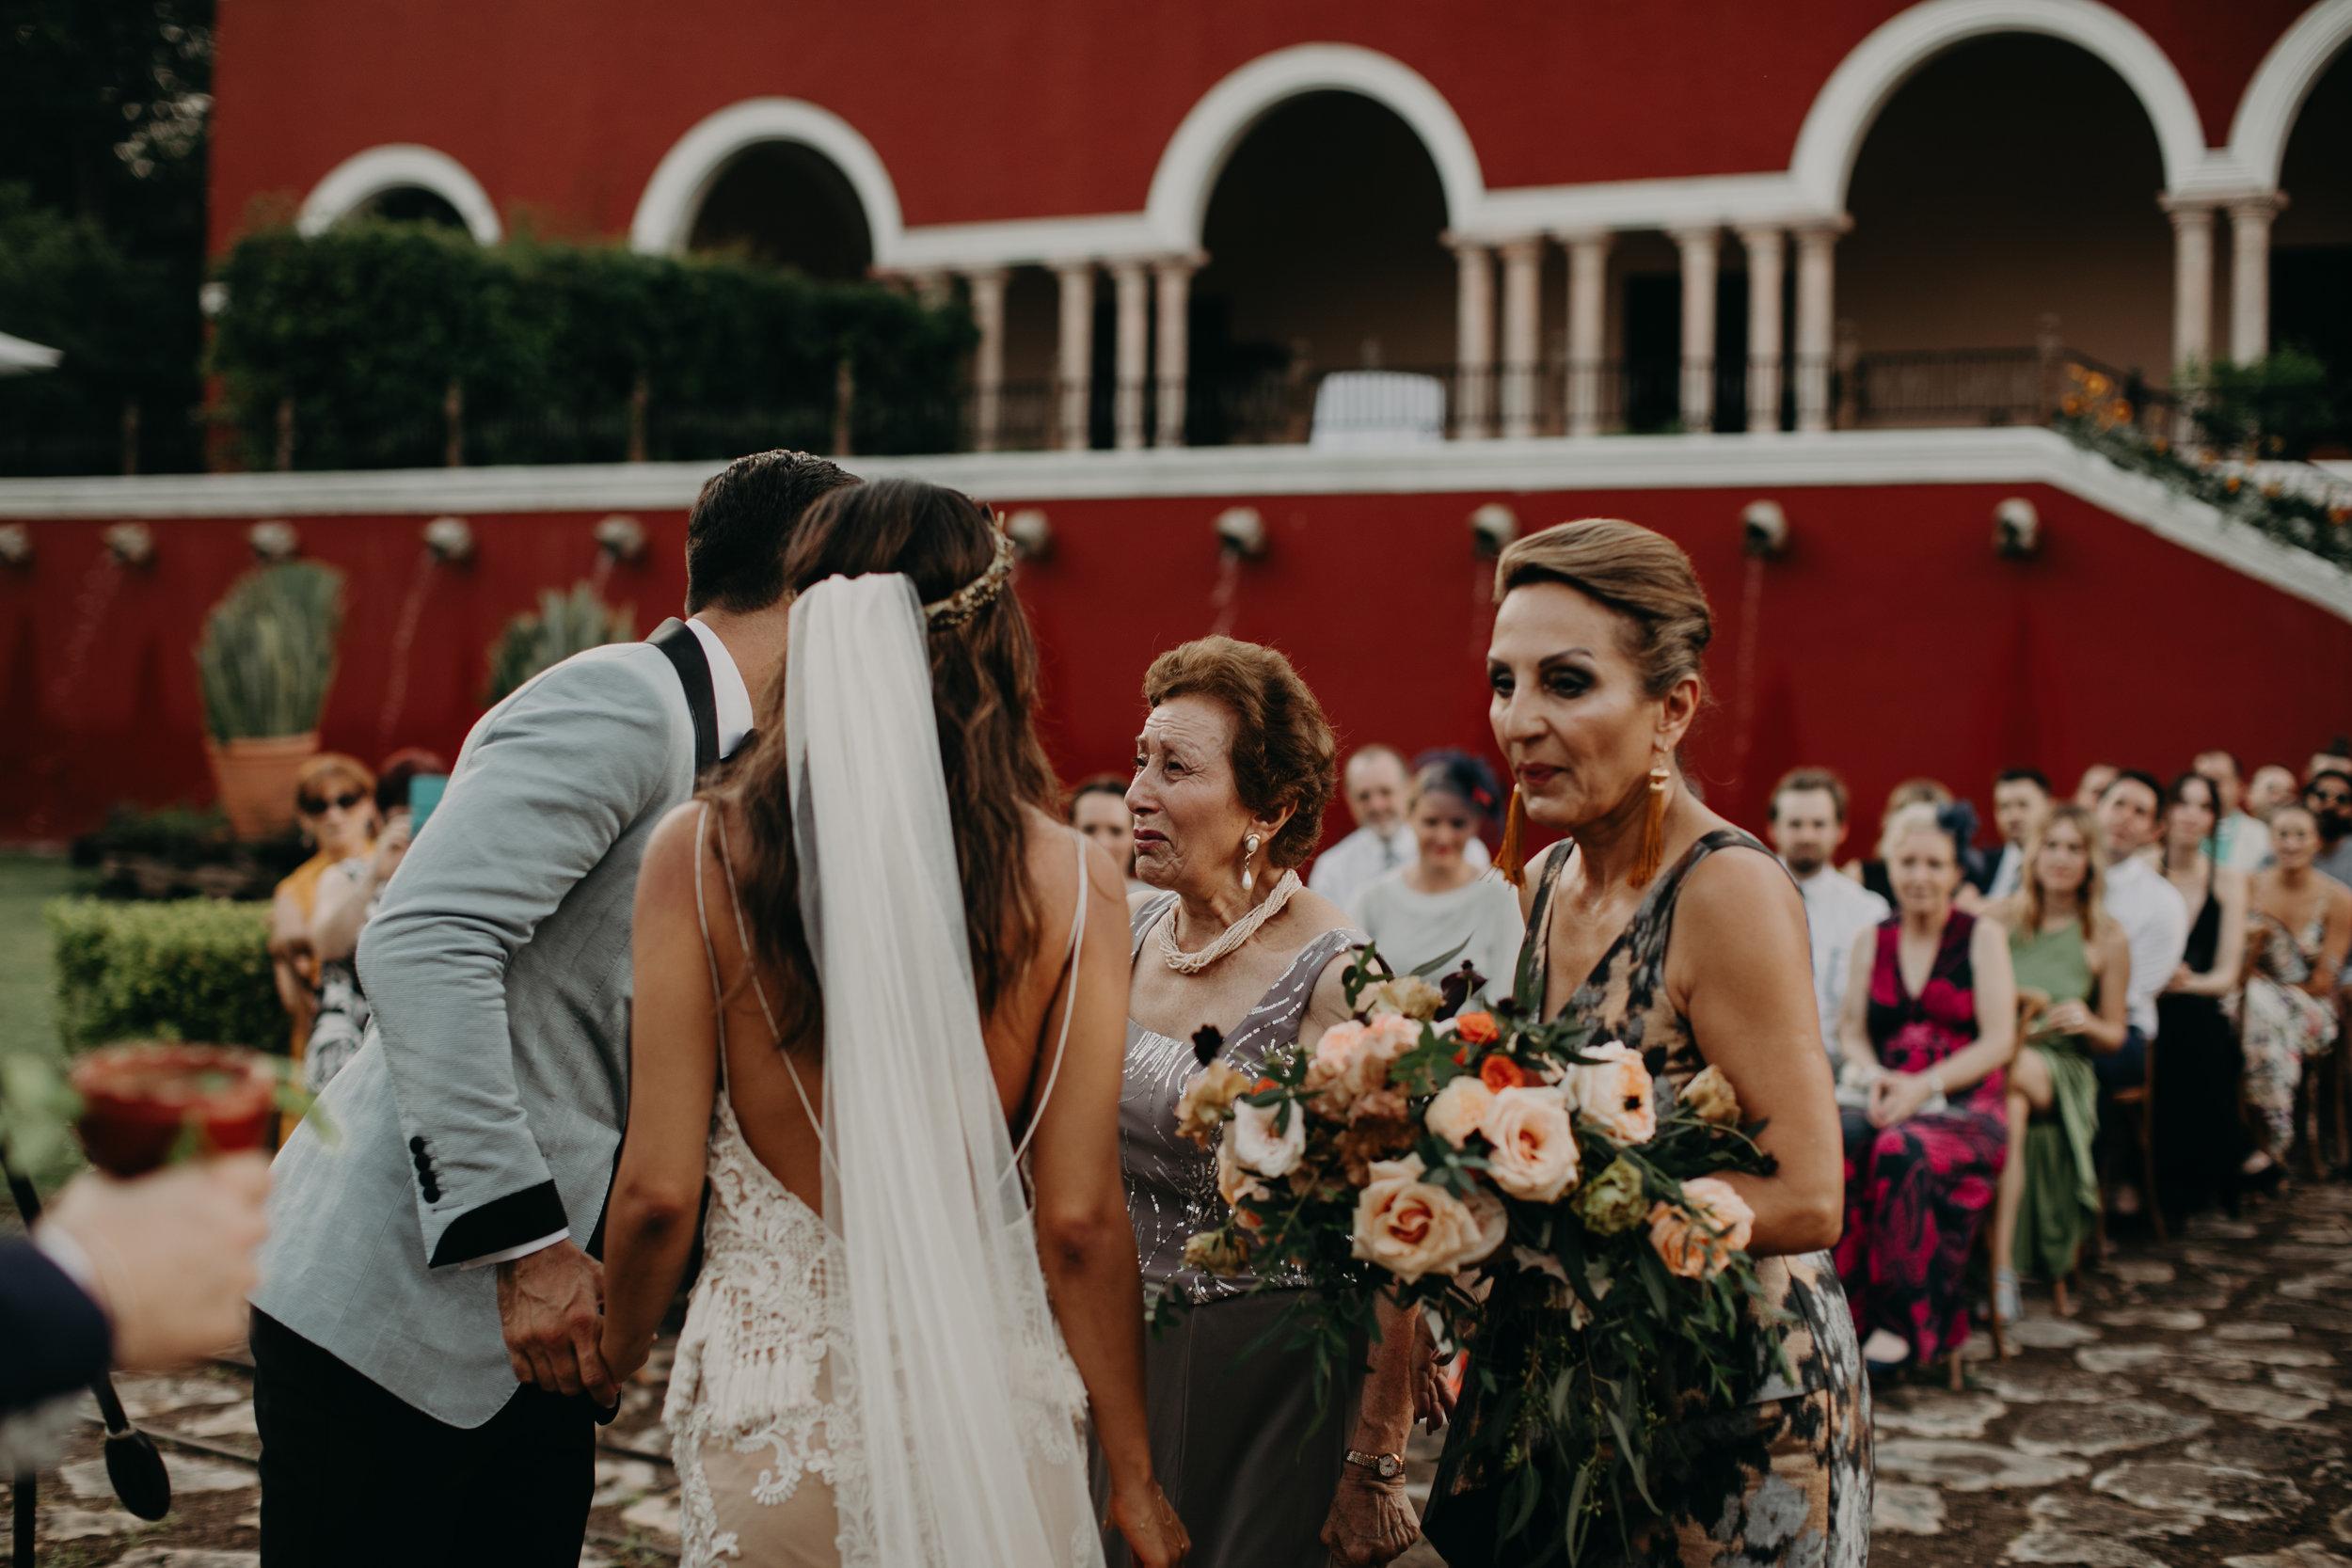 Hacienda Temozon Yucatan Mexico Wedding | Ida & Peter Emily Magers Photography-1074.jpg